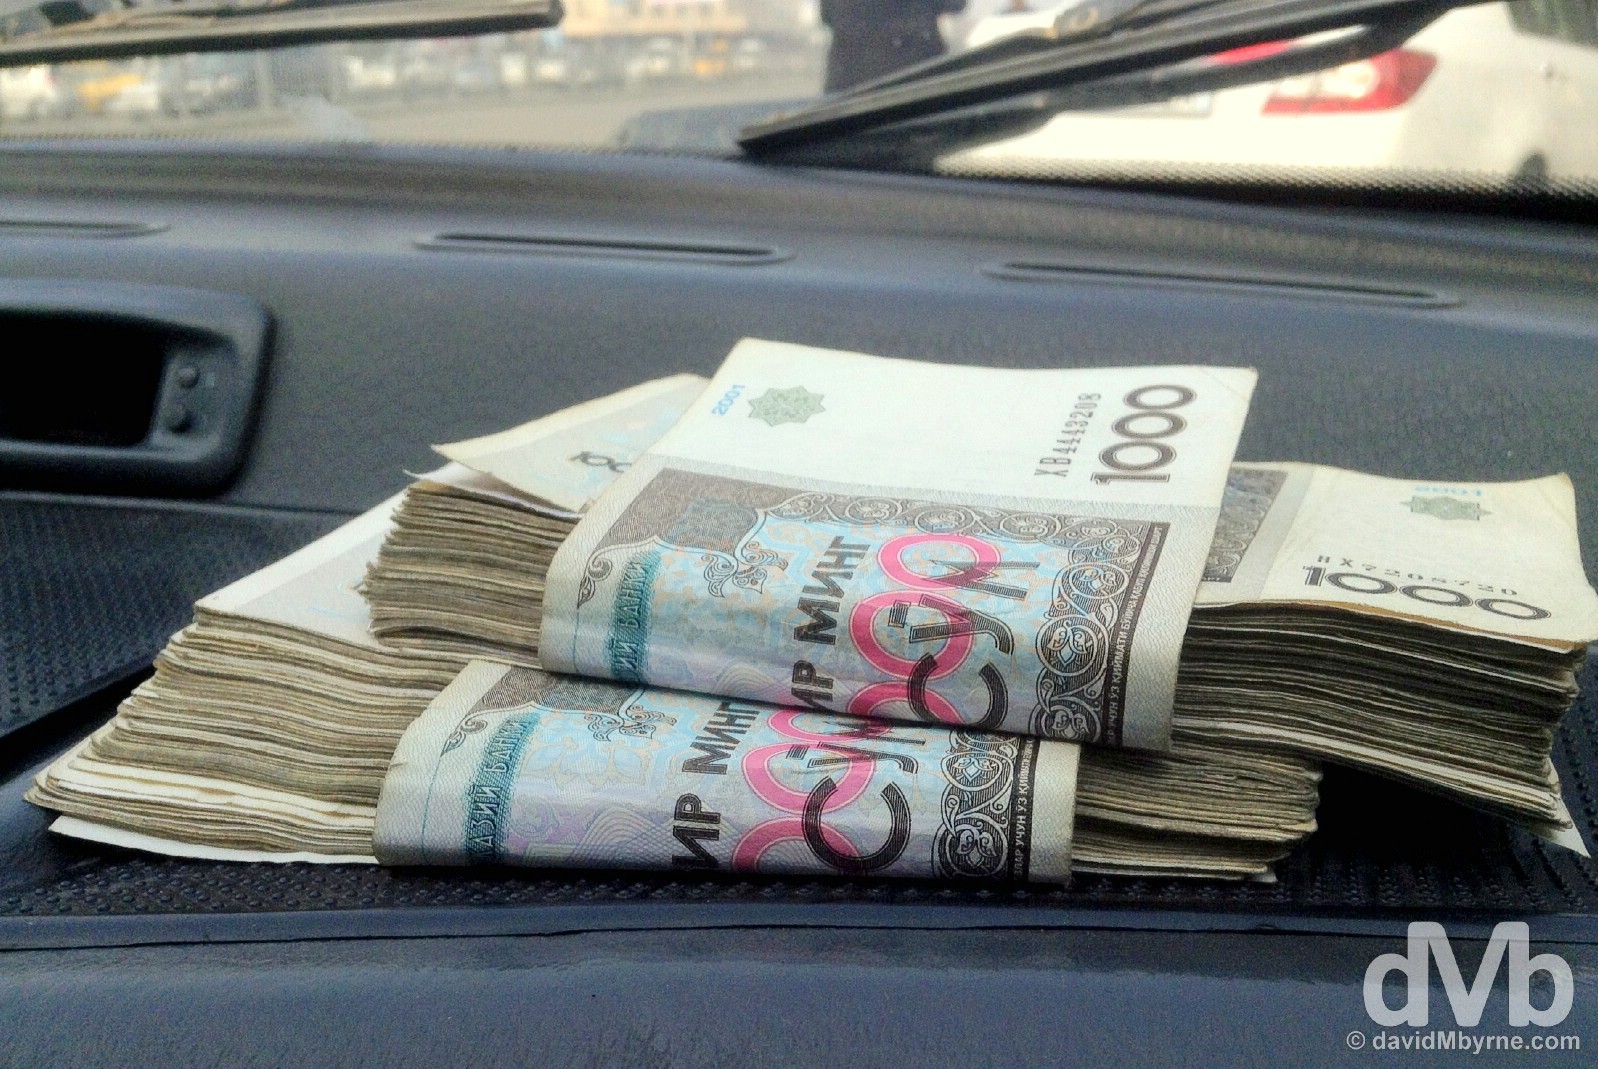 191 1,000 Uzbek som notes/bills equals a whole USD$50. Best have large pockets when you visit Uzbekistan. Andijon, Uzbekistan. March 4, 2015.